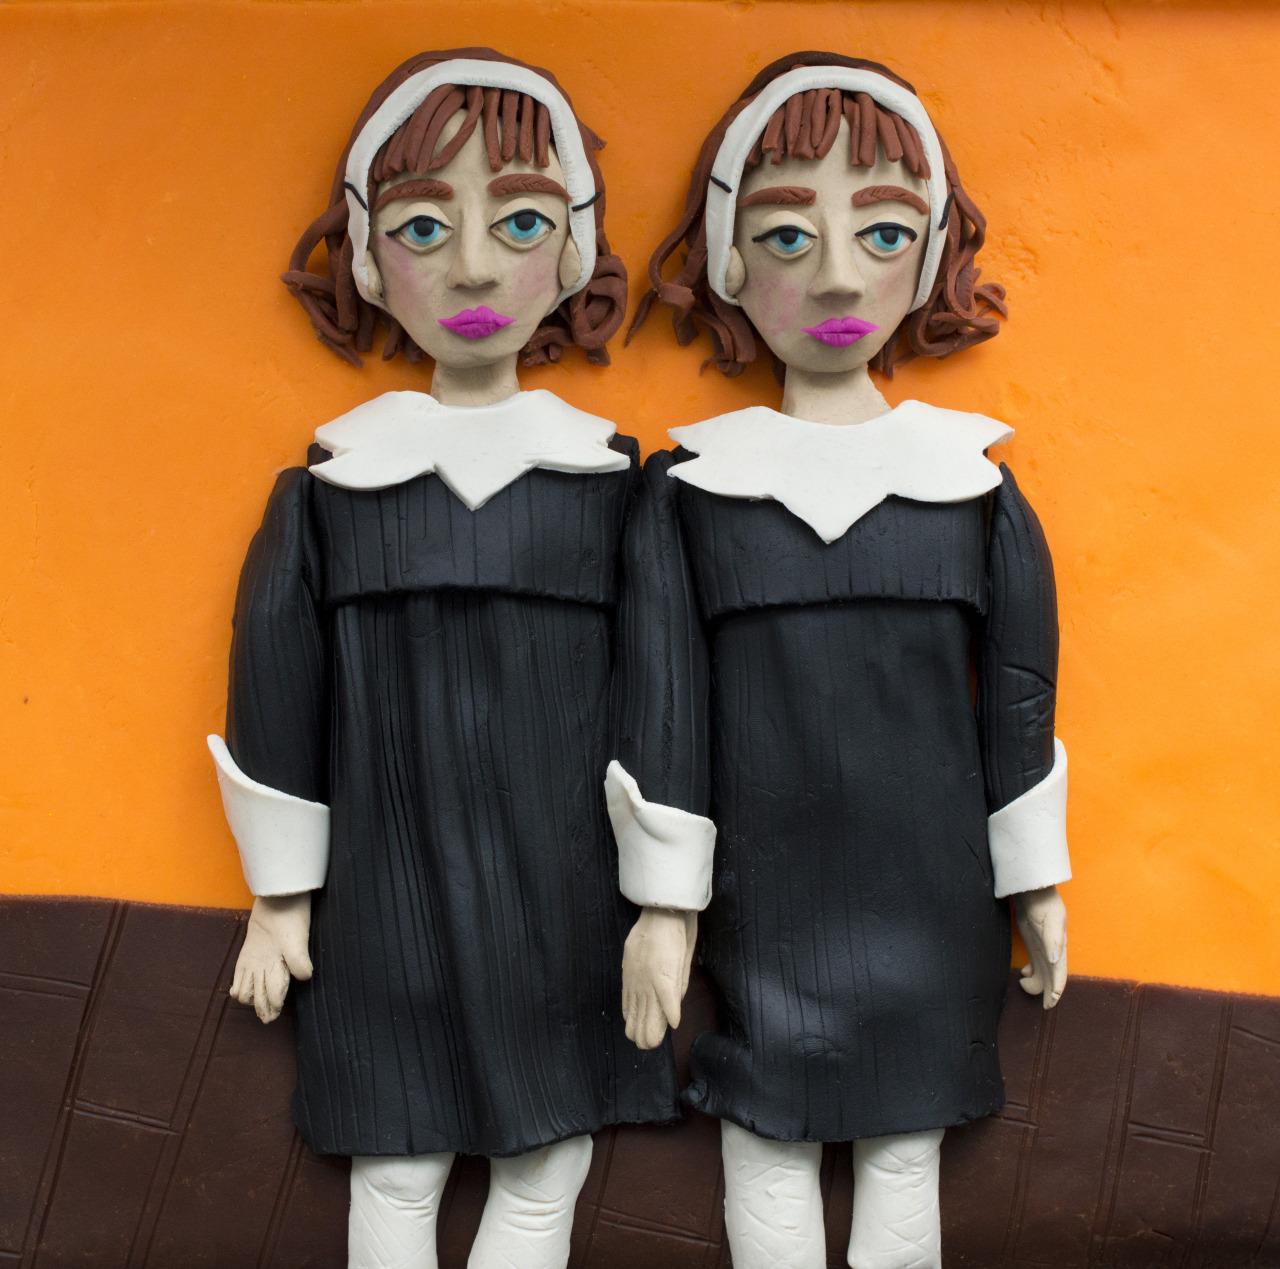 """Identical Twins, Roselle, N.J."", di Diane Arbus, 1967 (guarda l'originale)"